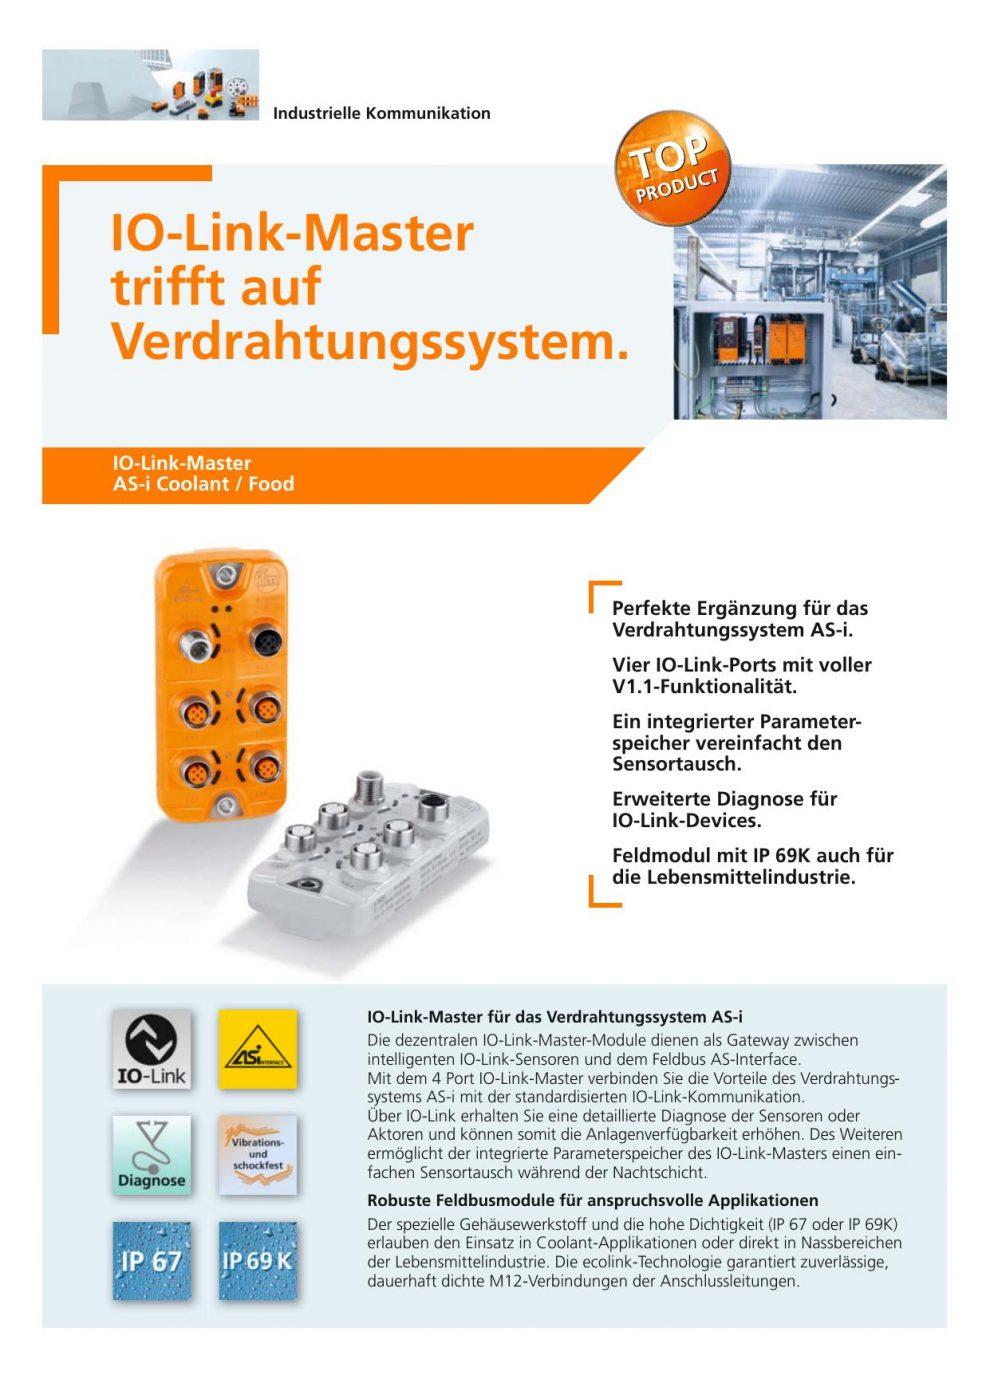 IO-Link-Master-Module